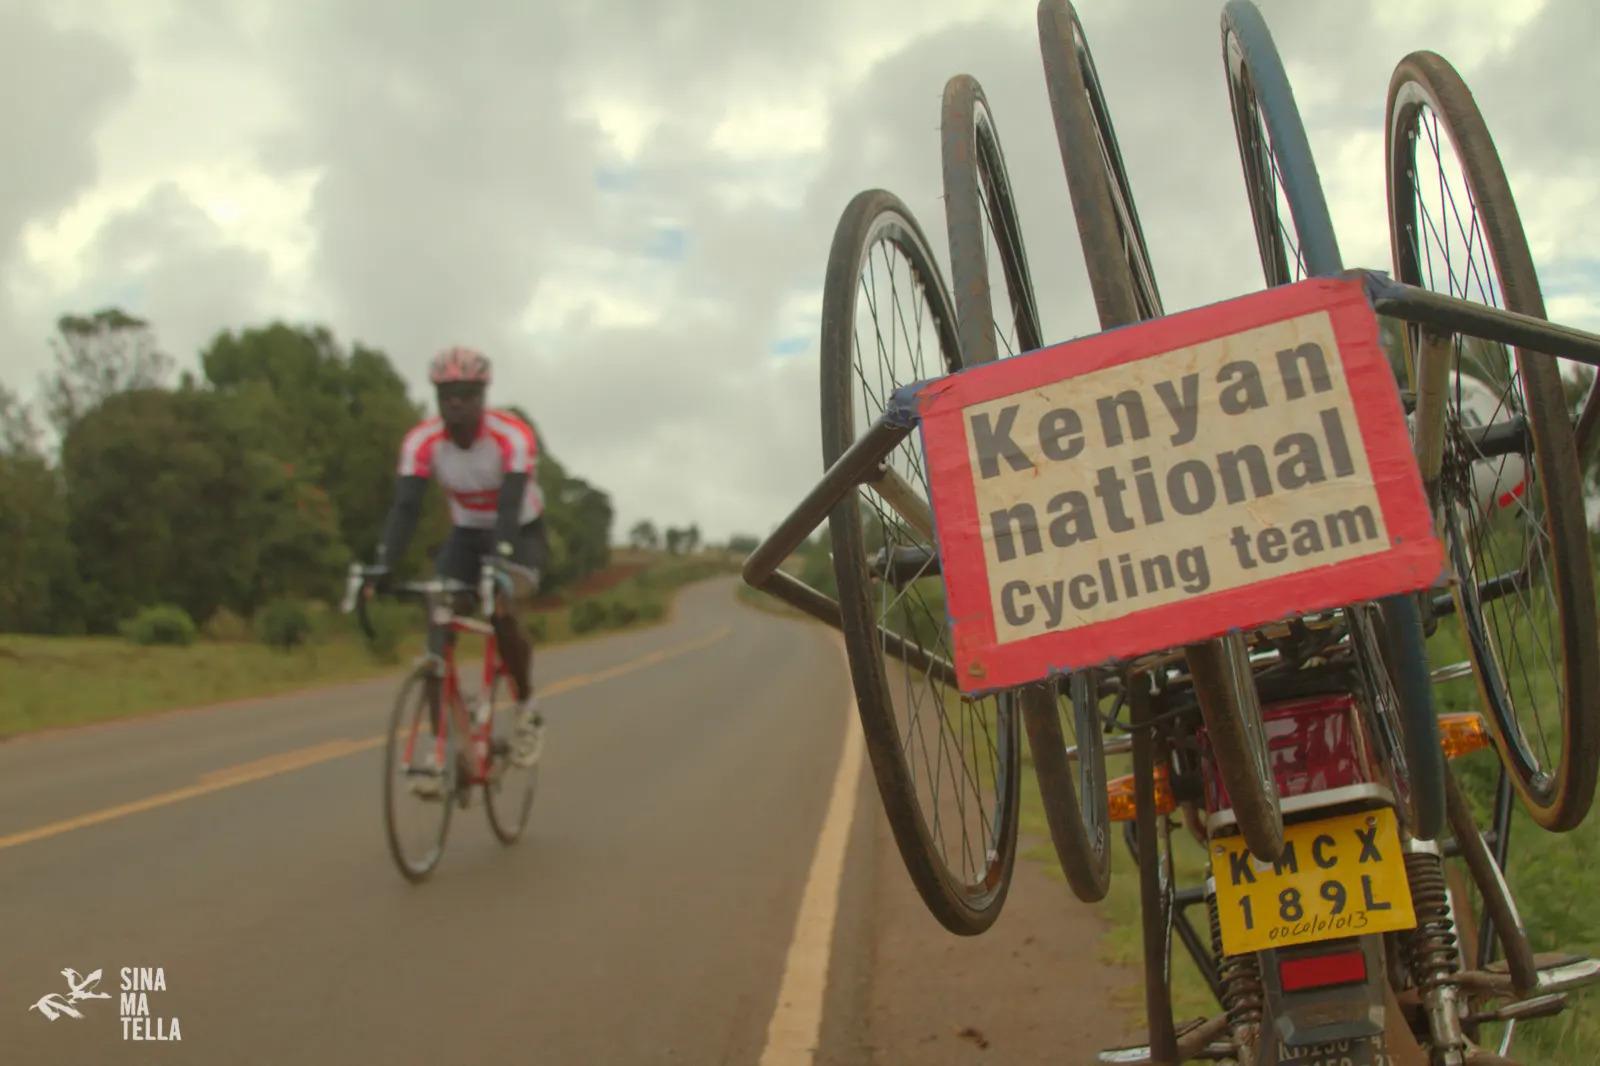 Kenyan National Cycling Team